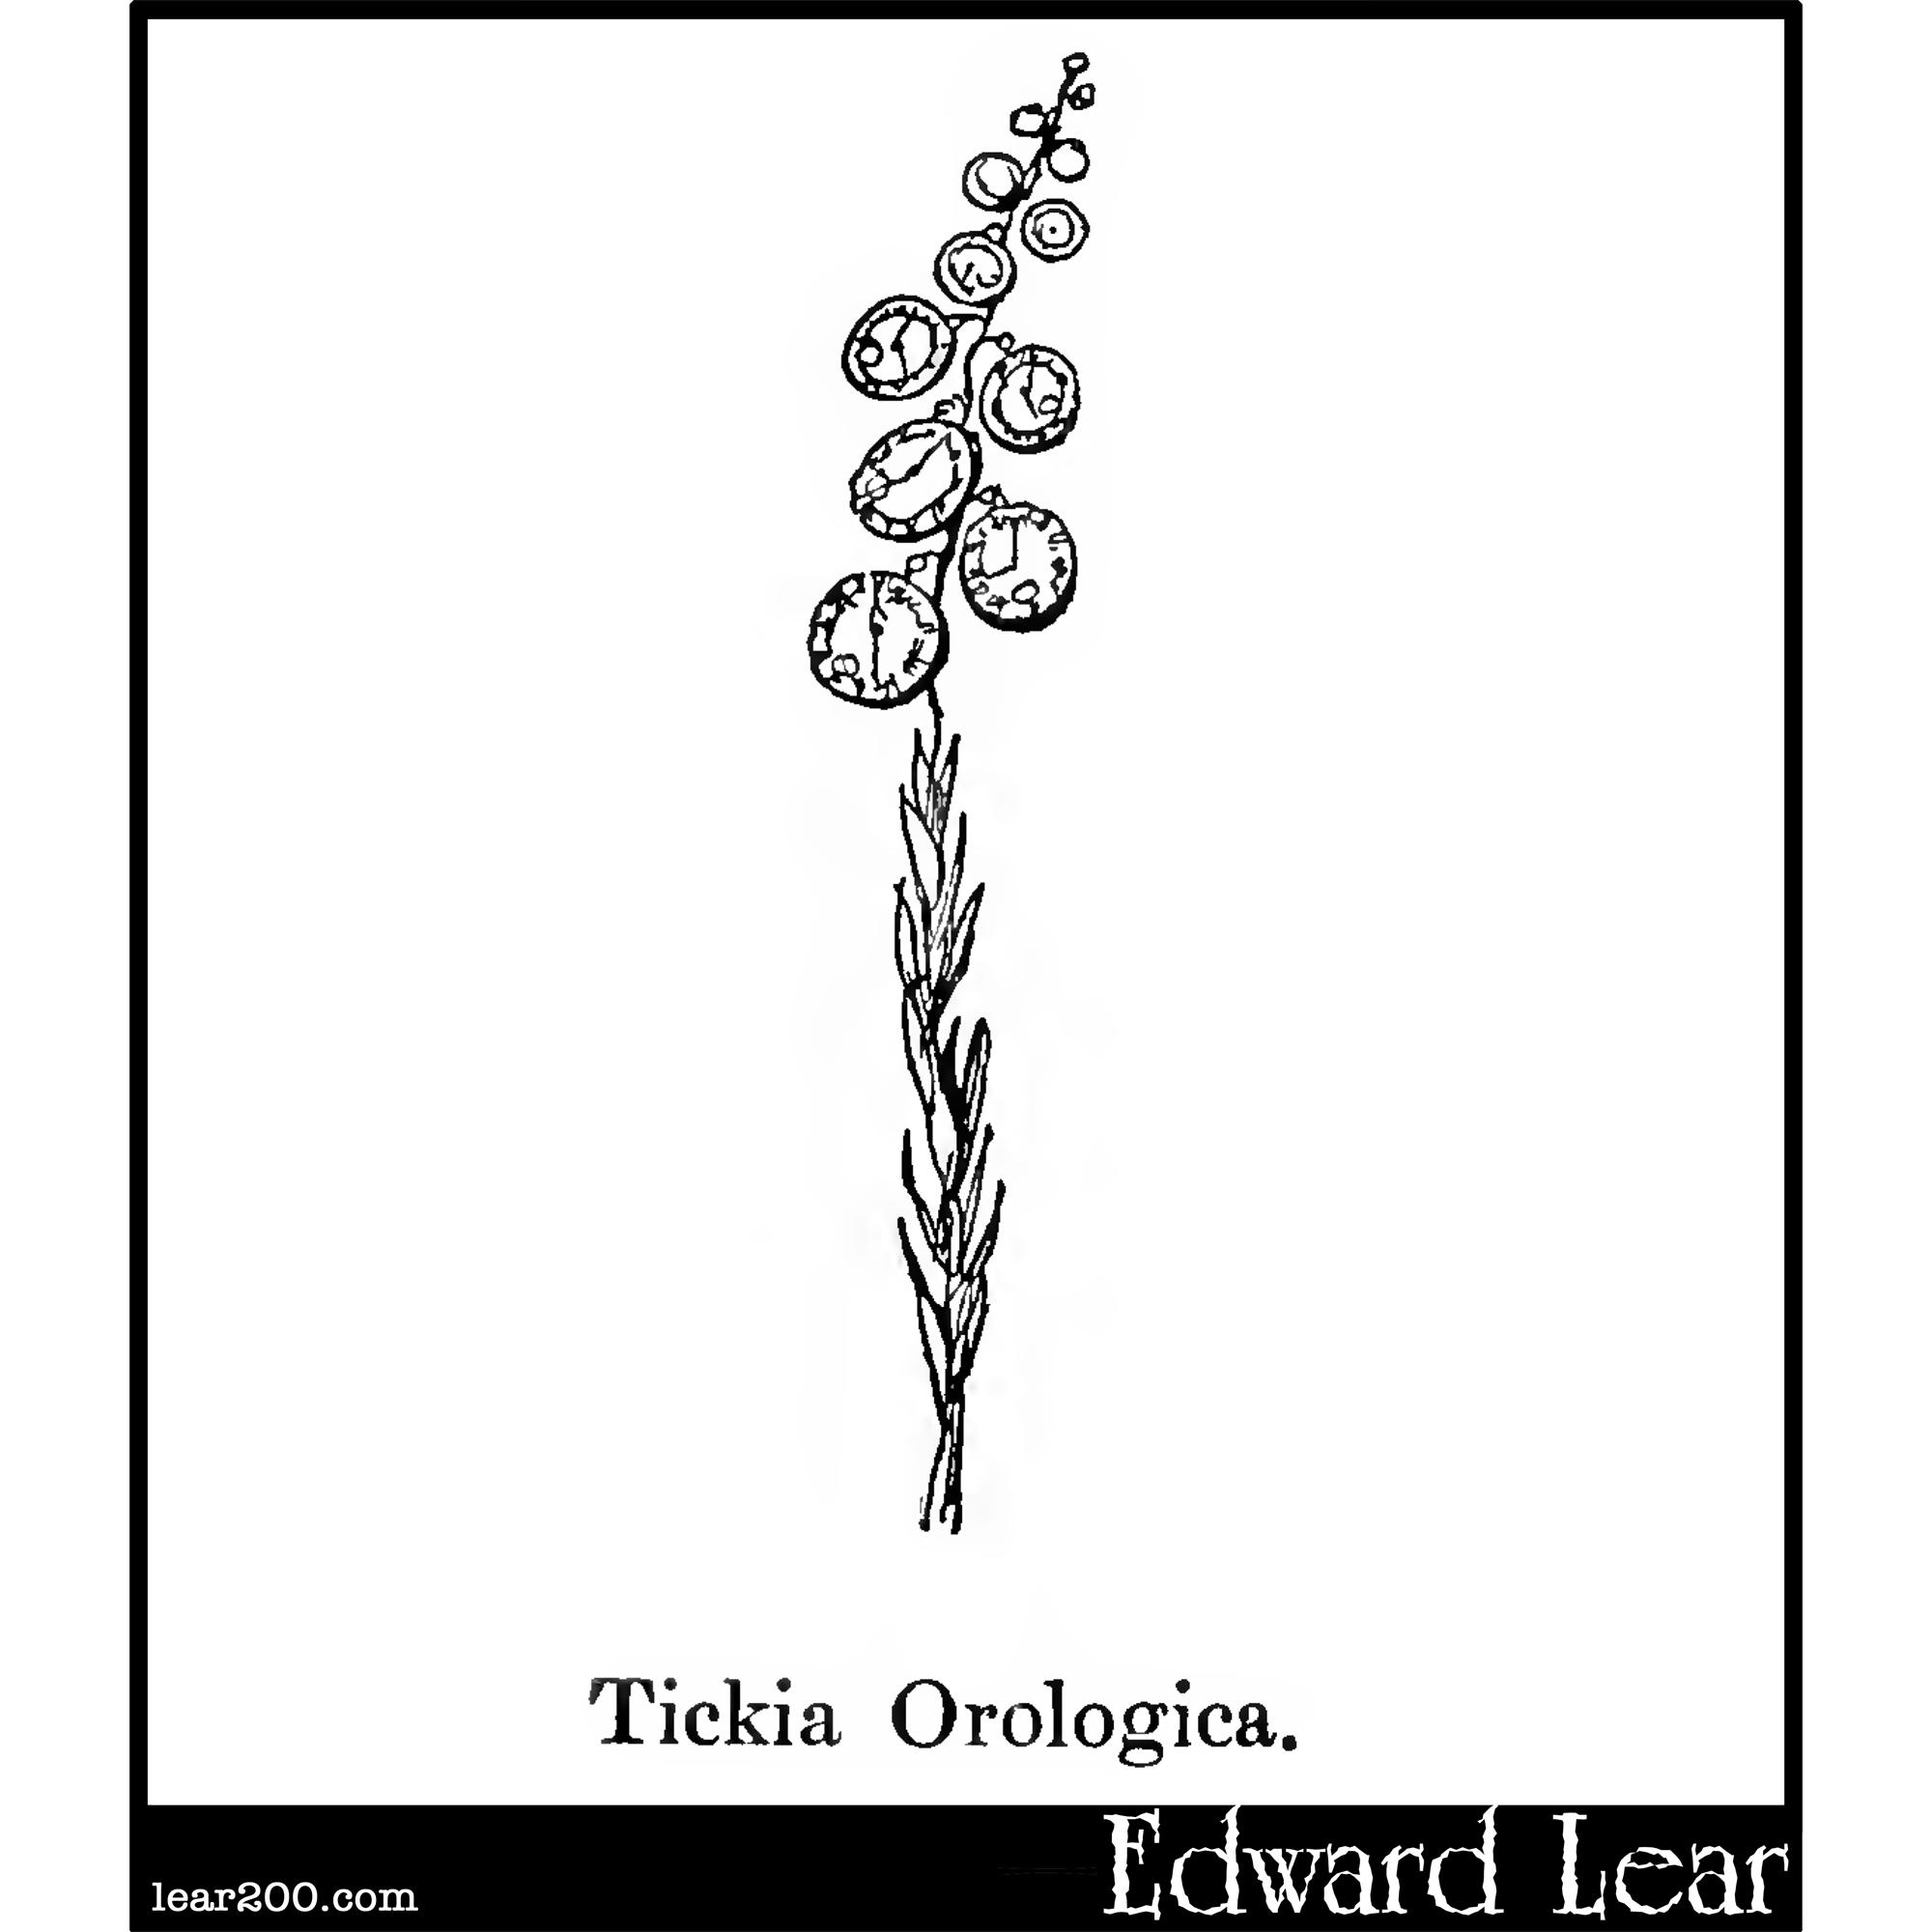 Tickia Orologica